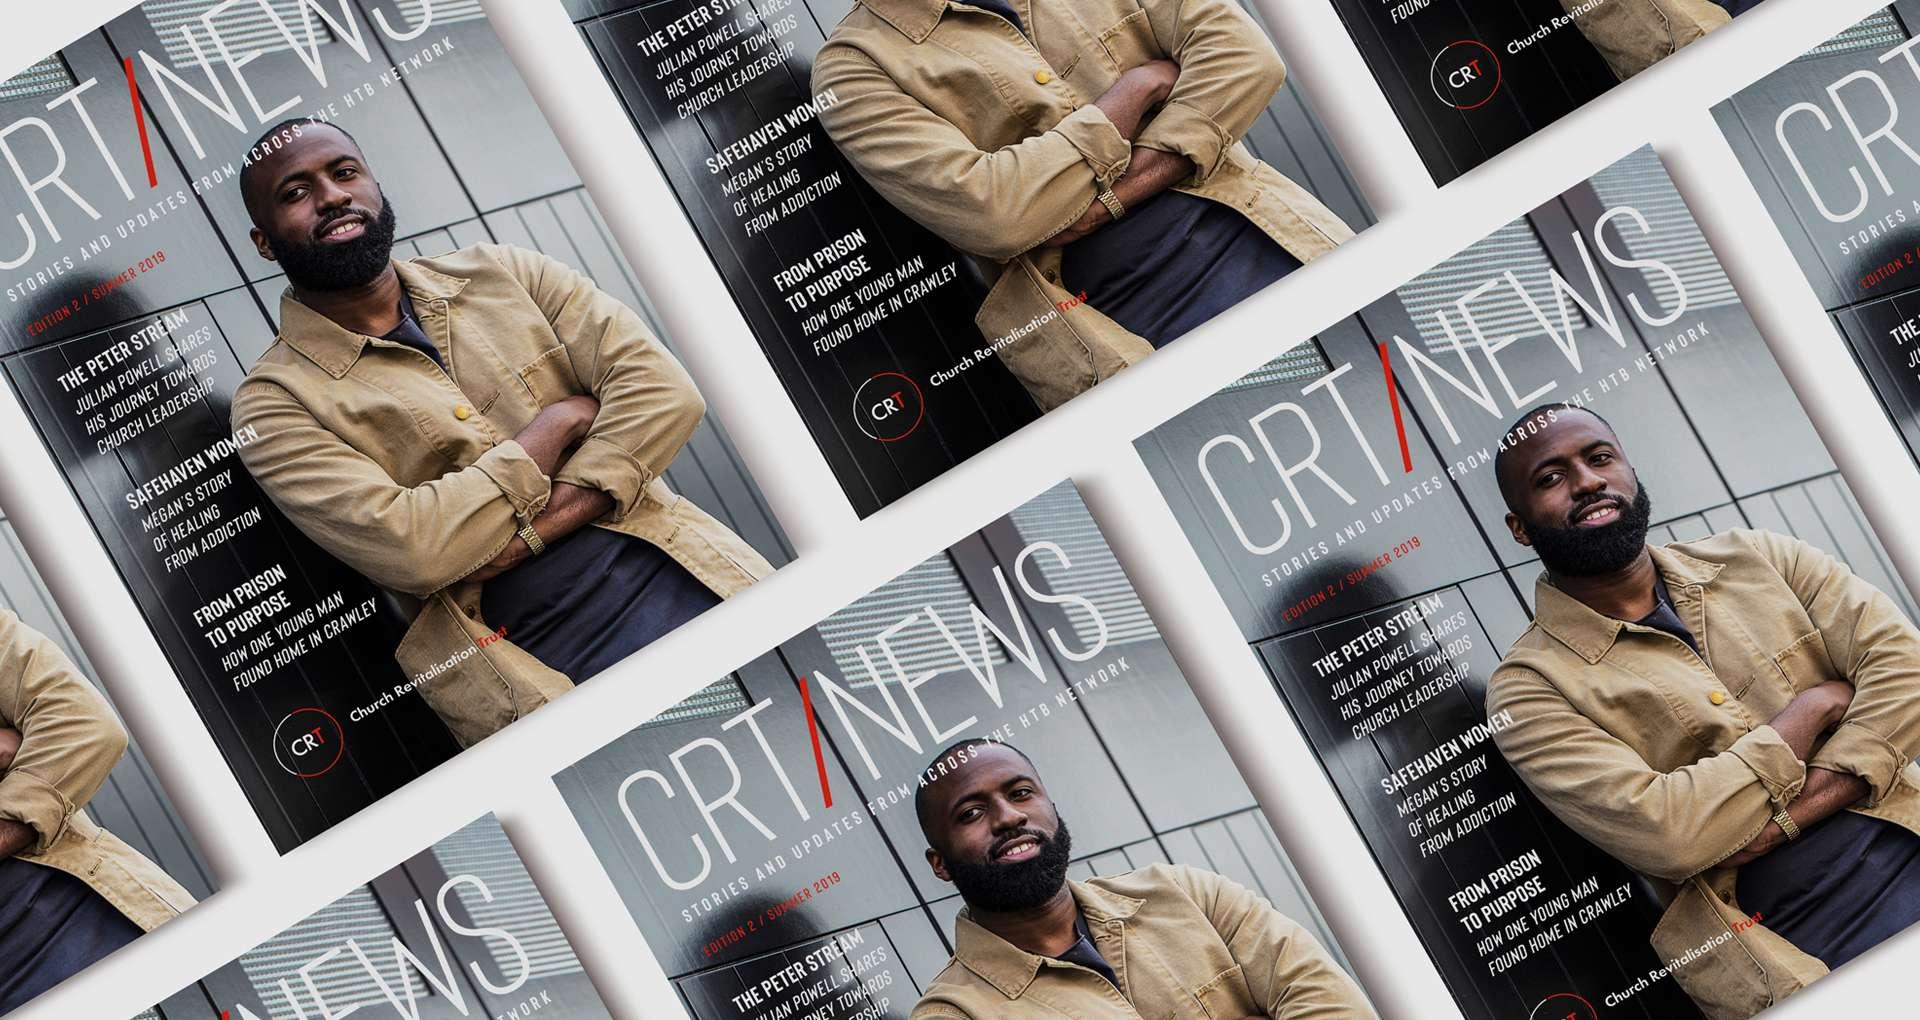 CRT Magazine